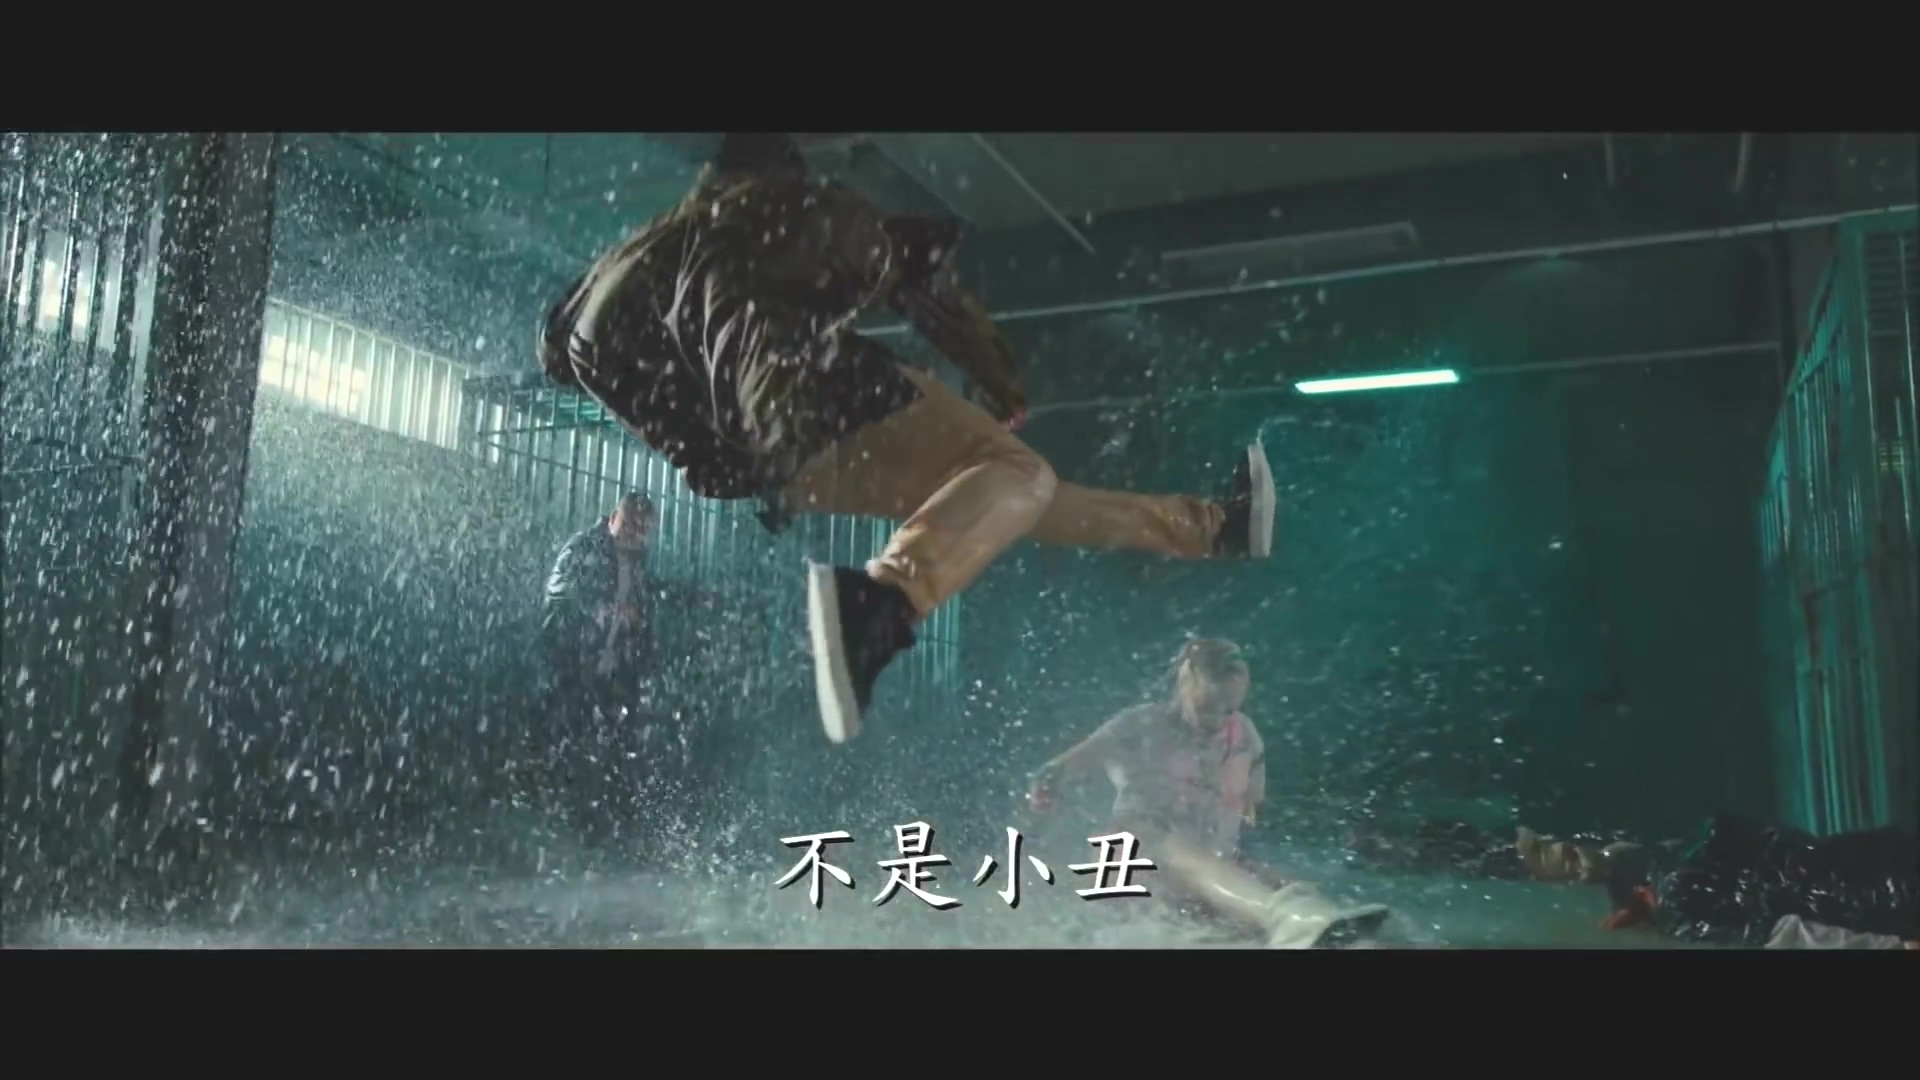 DC新片《猛禽小队》首曝中字预告 华裔导演阎羽茜执导